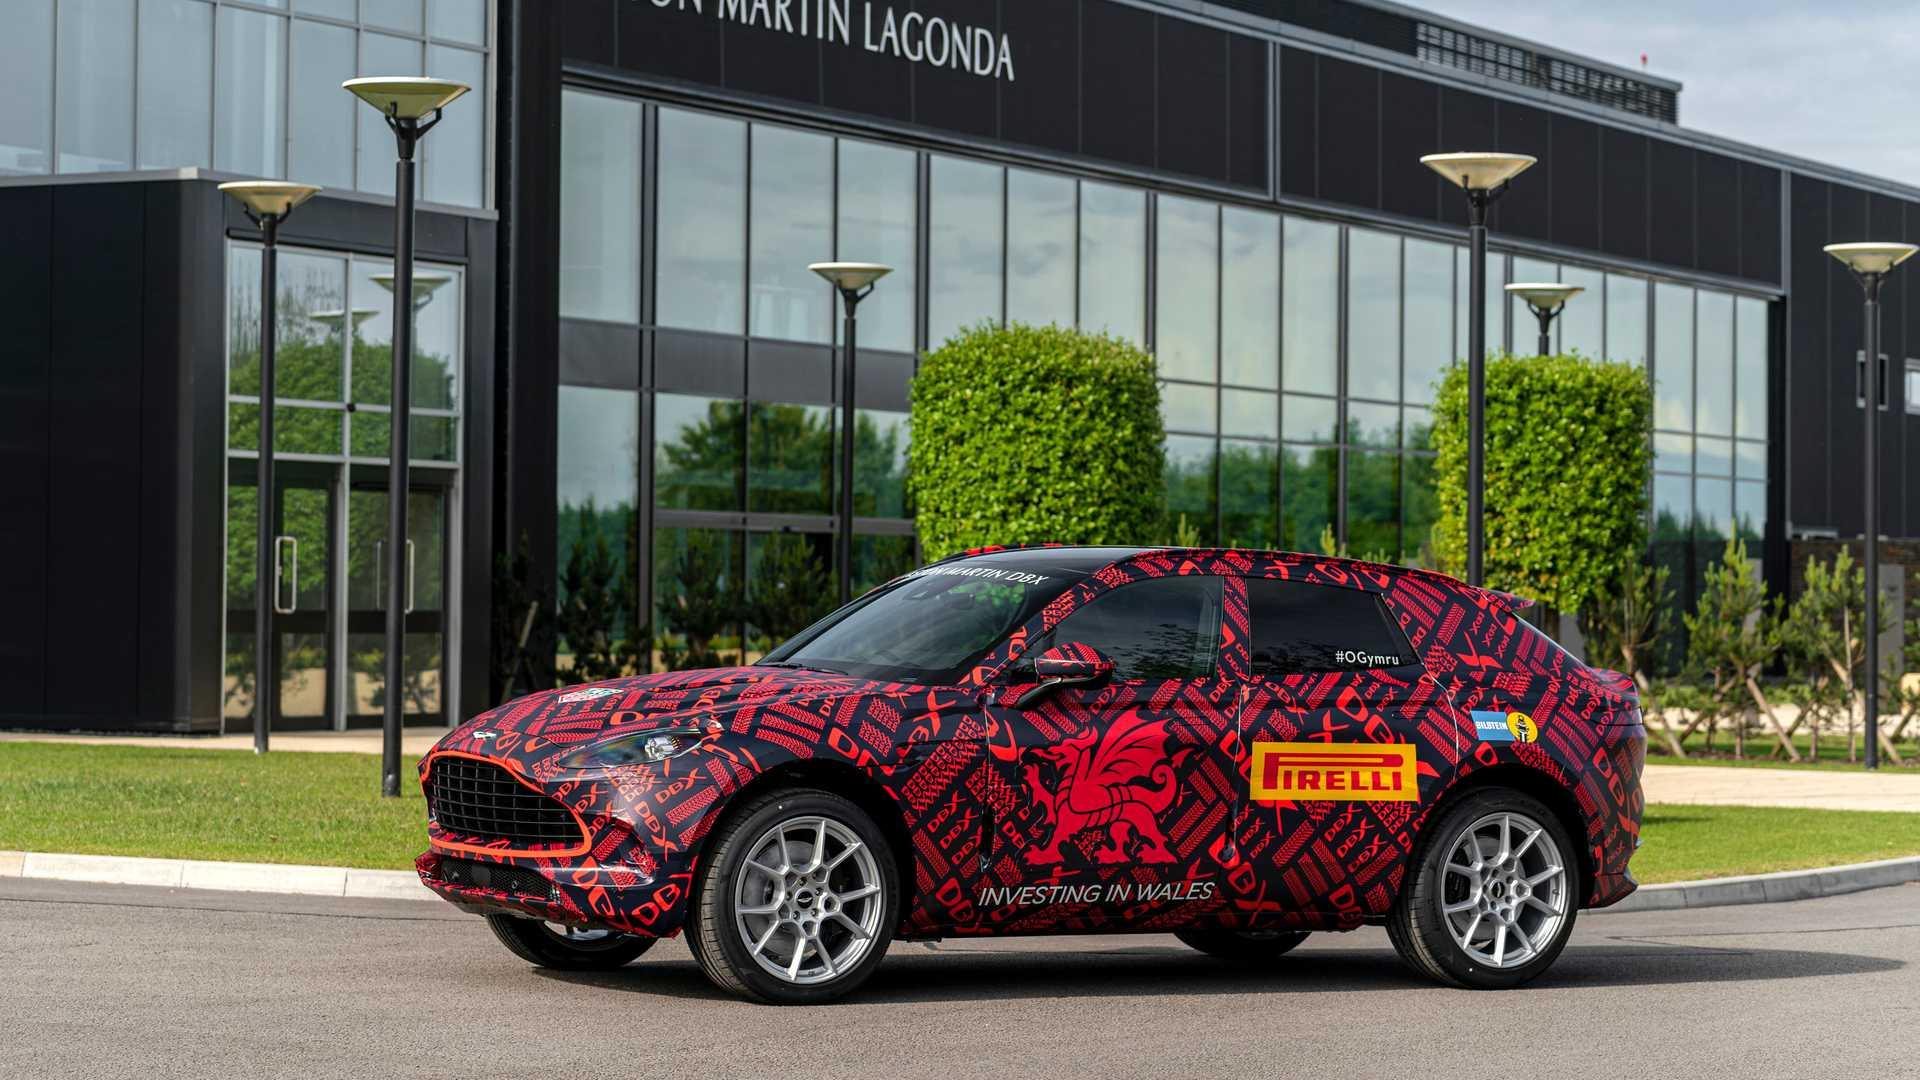 Aston Martin тестирует кроссовер на скорости 300 км/ч 2